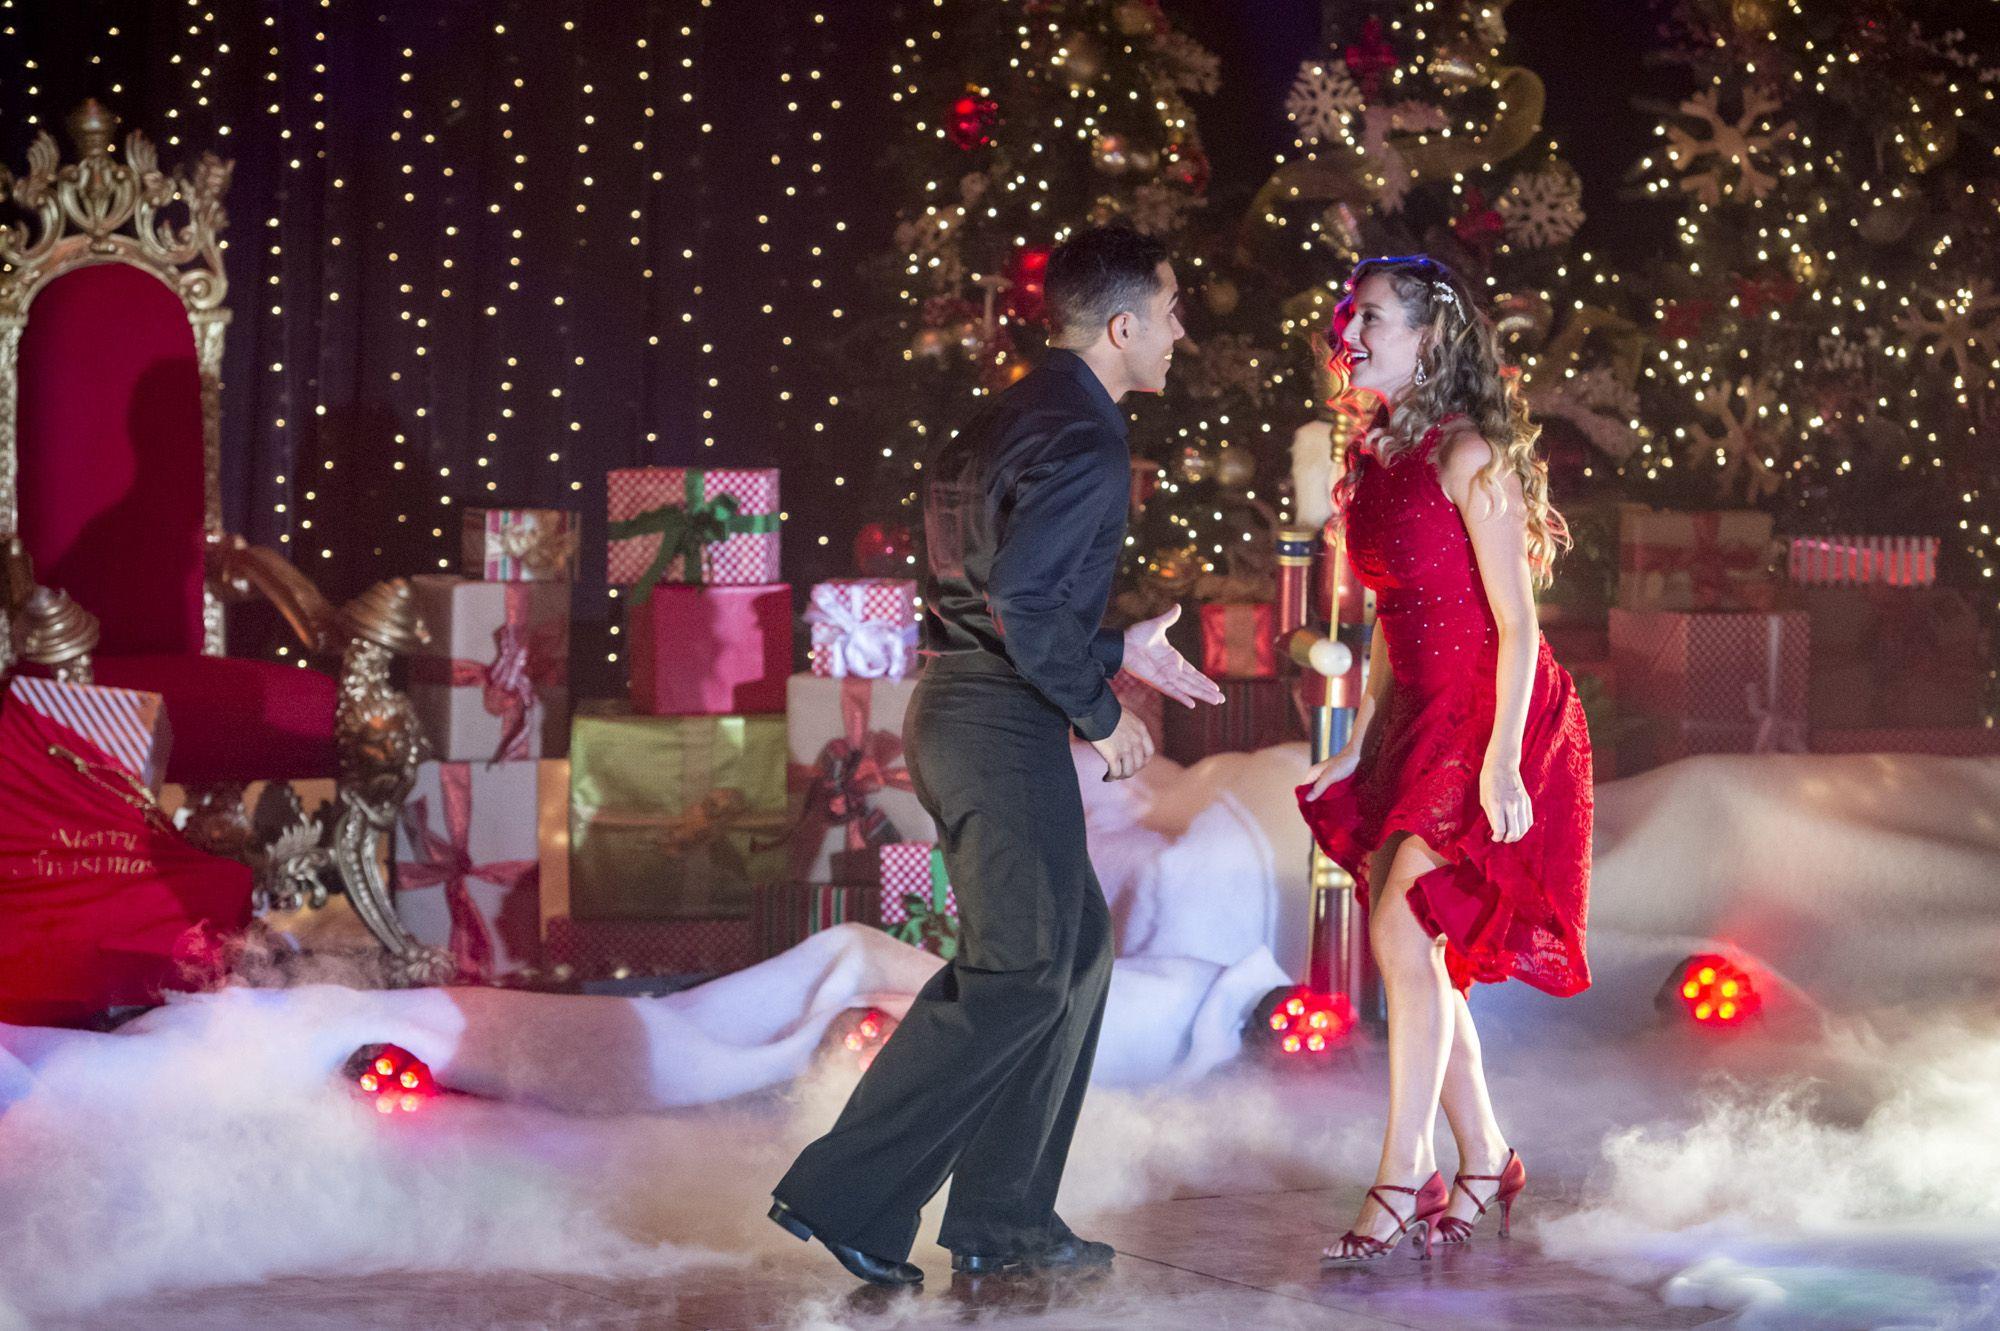 hallmark christmas movie premiere dates 2017 new hallmark holiday films